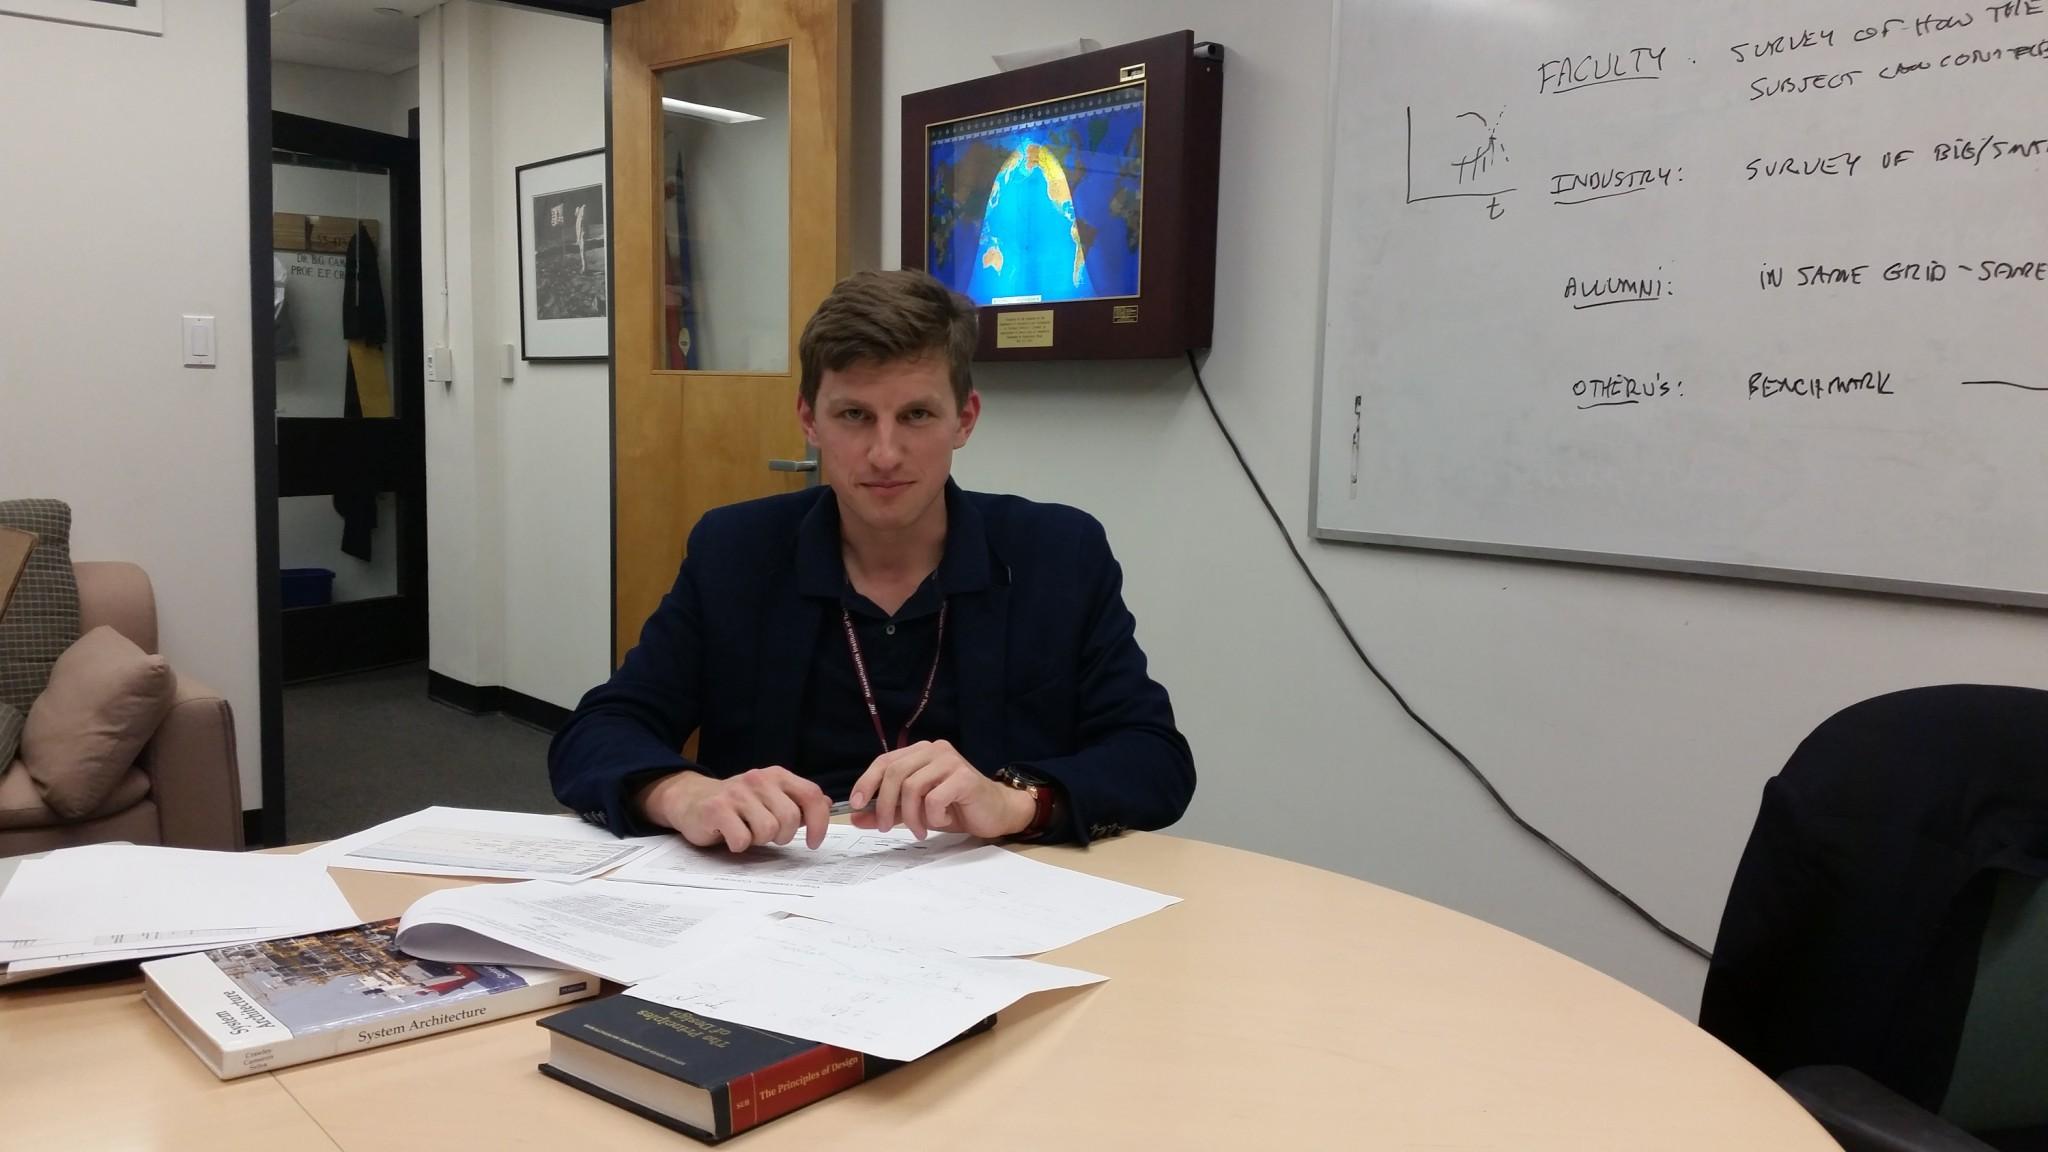 Skoltech PhD candidate Yaroslav Menshenin pictured in the MIT office of his supervisor Edward Crawley, Skoltech's founding president. Photo: Yaroslav Menshenin // Skoltech.